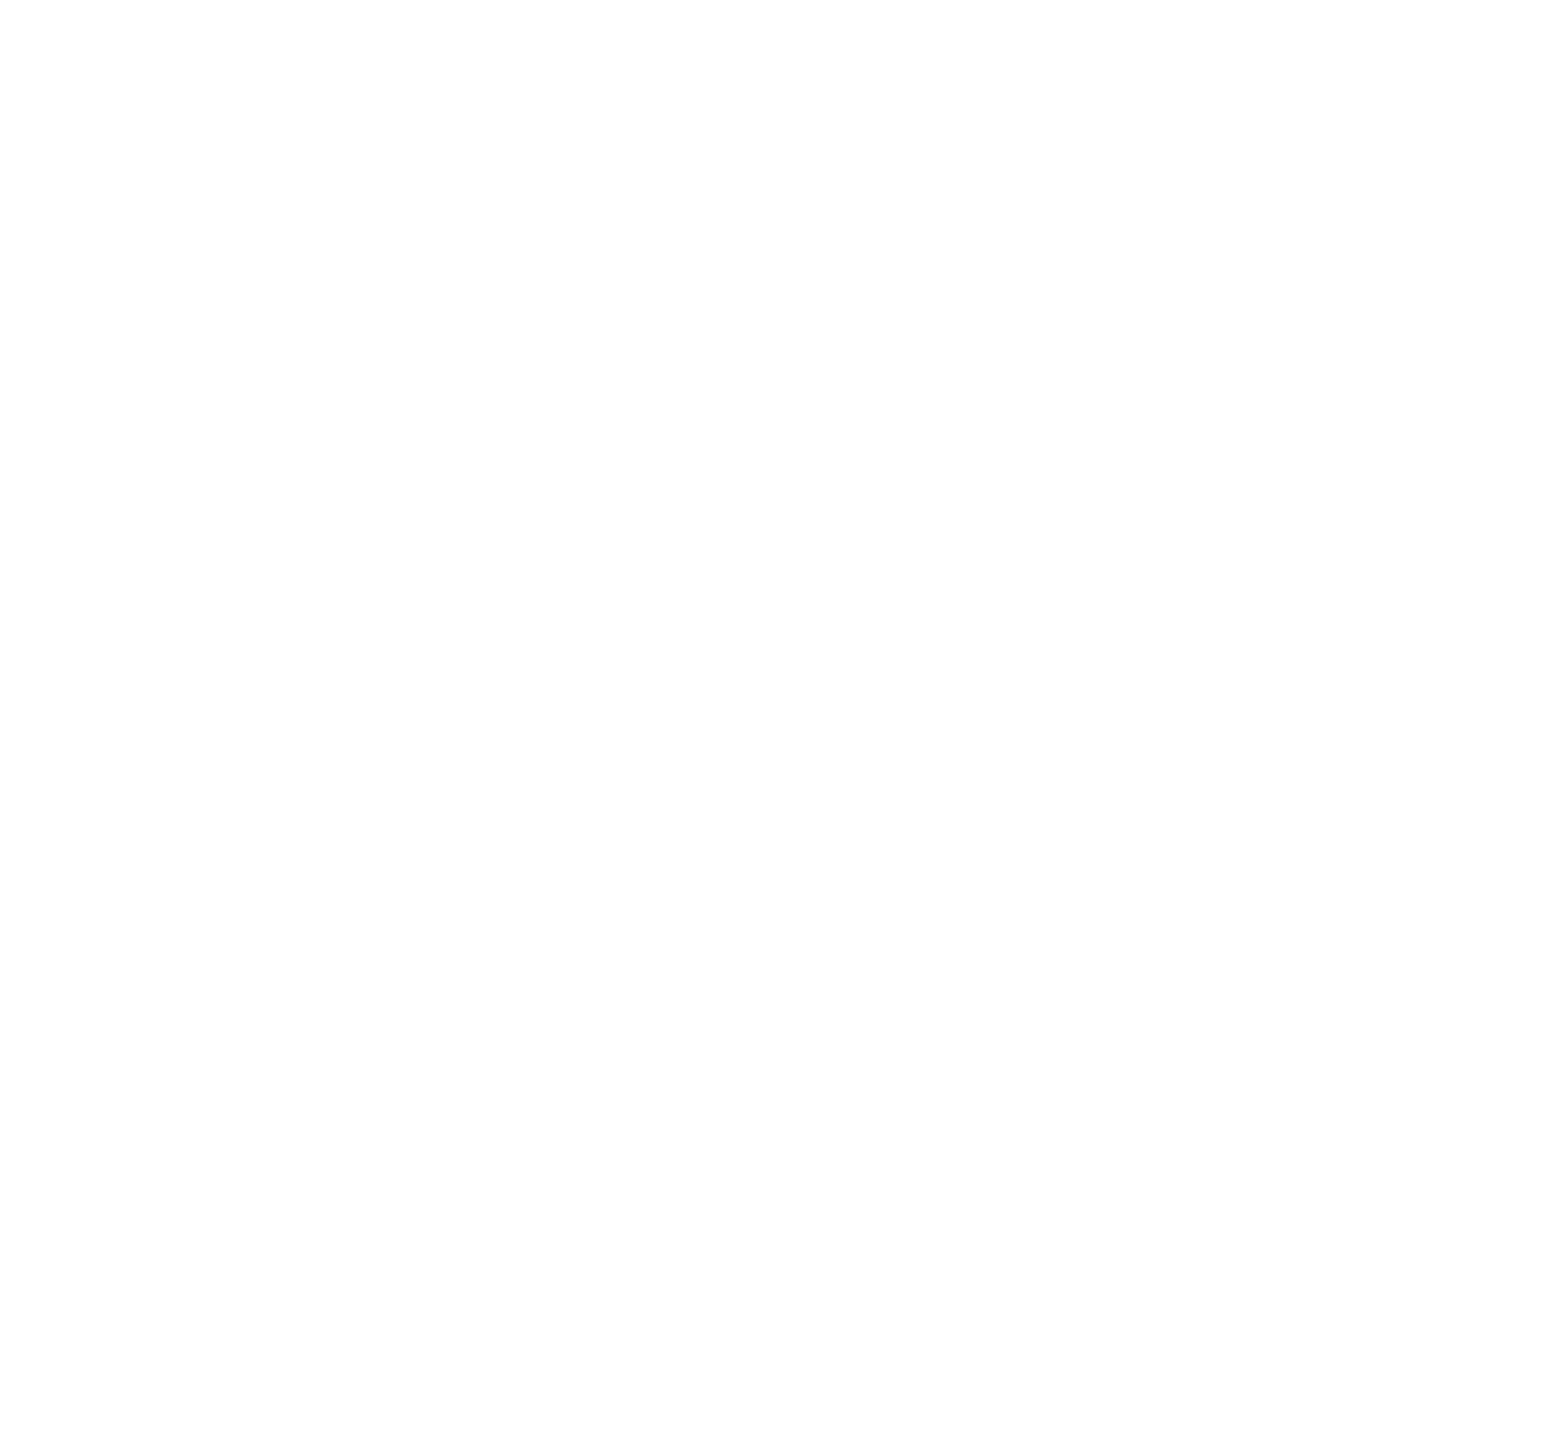 RawArtist